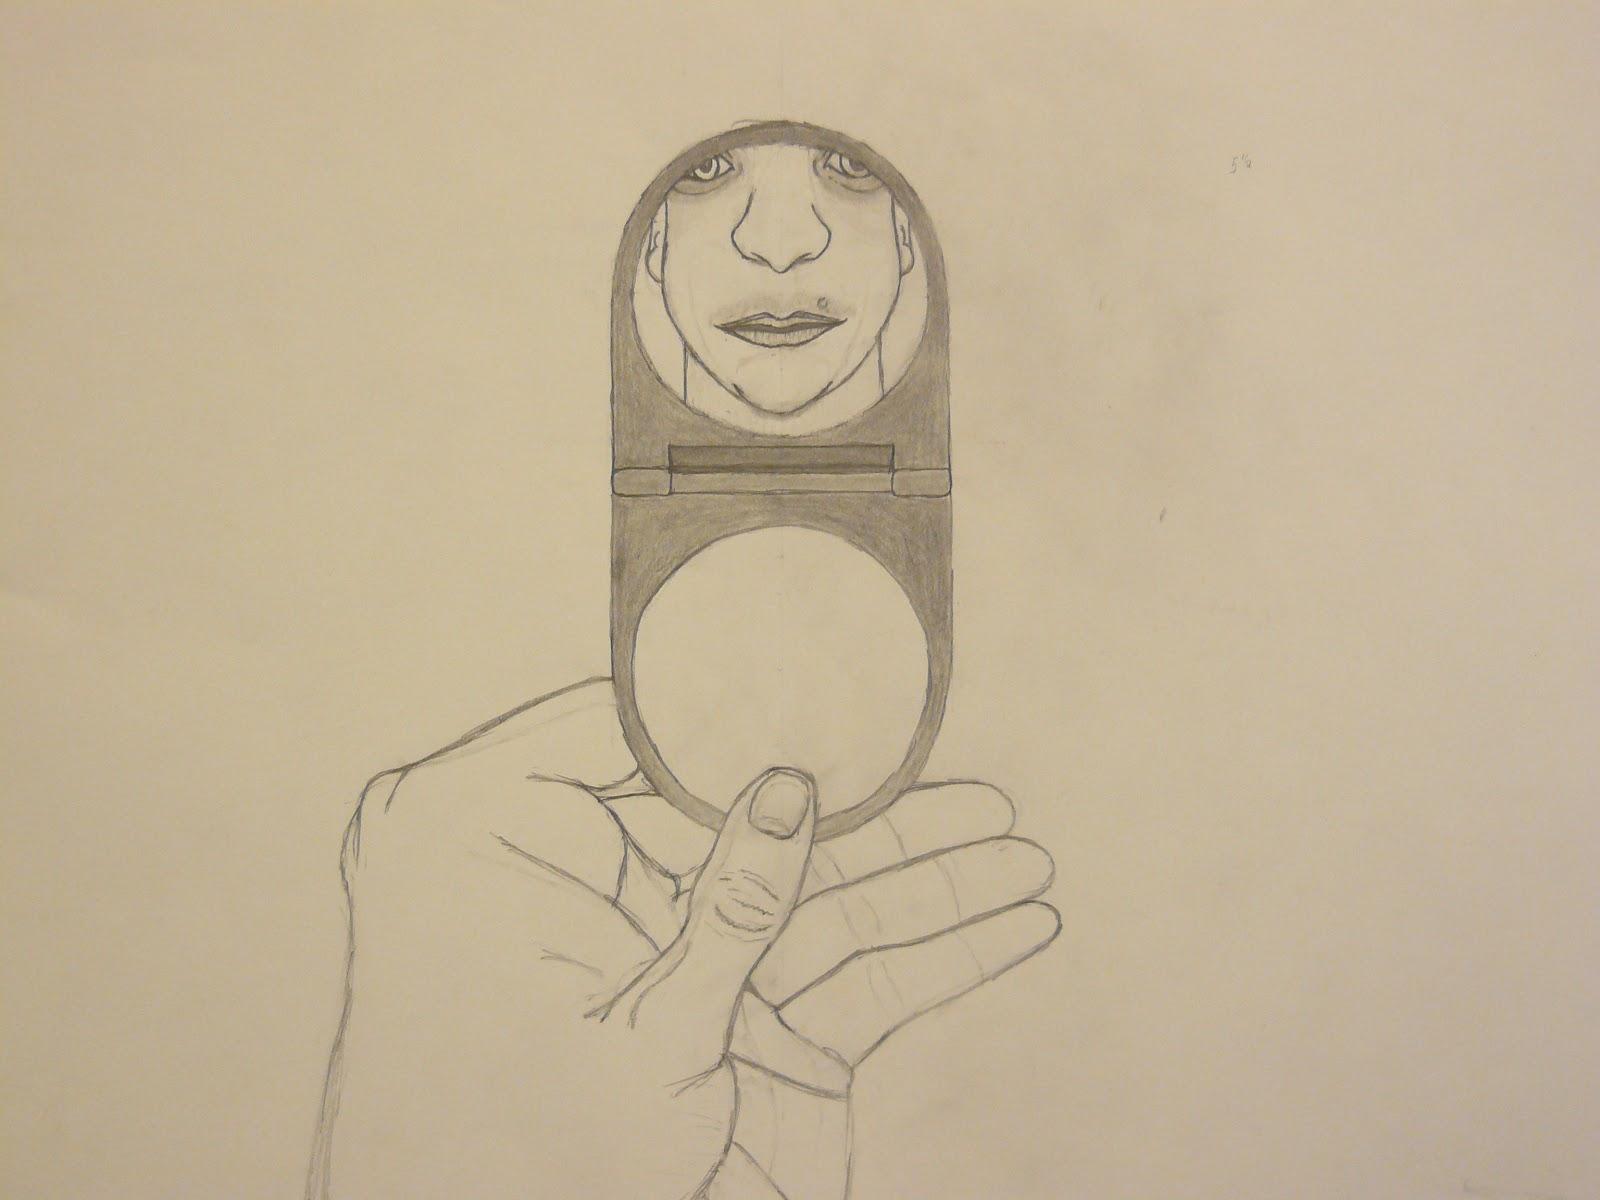 hand mirror sketch. Drawing I Class Hand Mirror Sketch